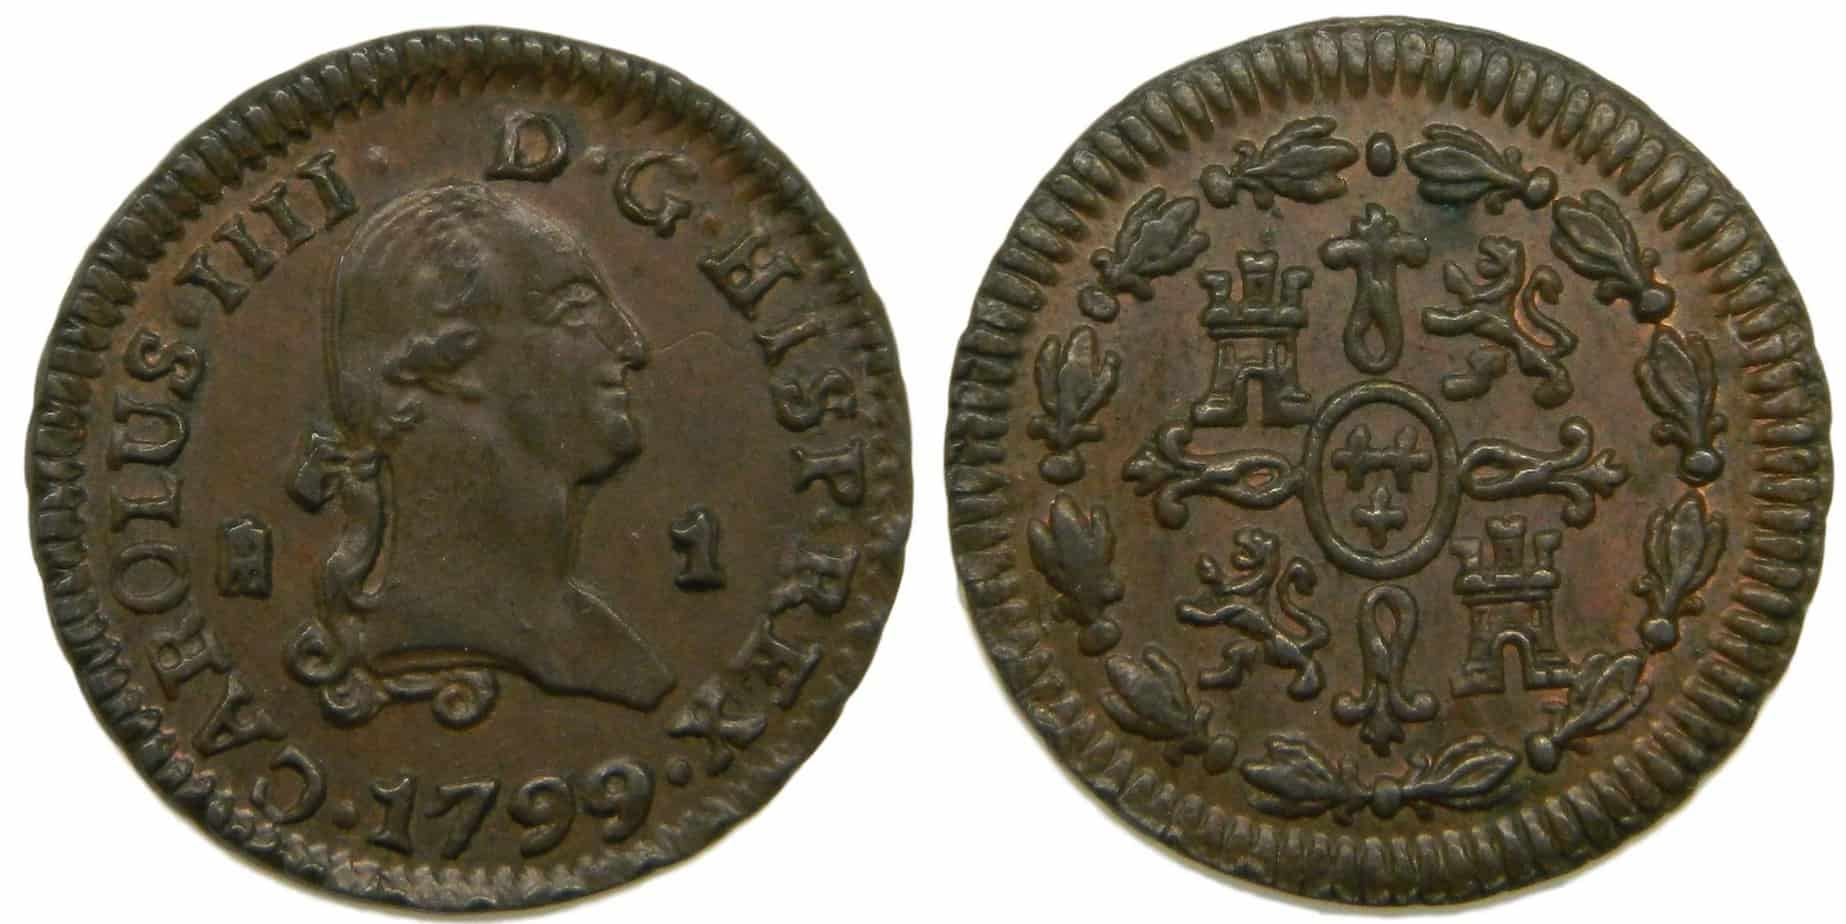 1 maravedí 1799